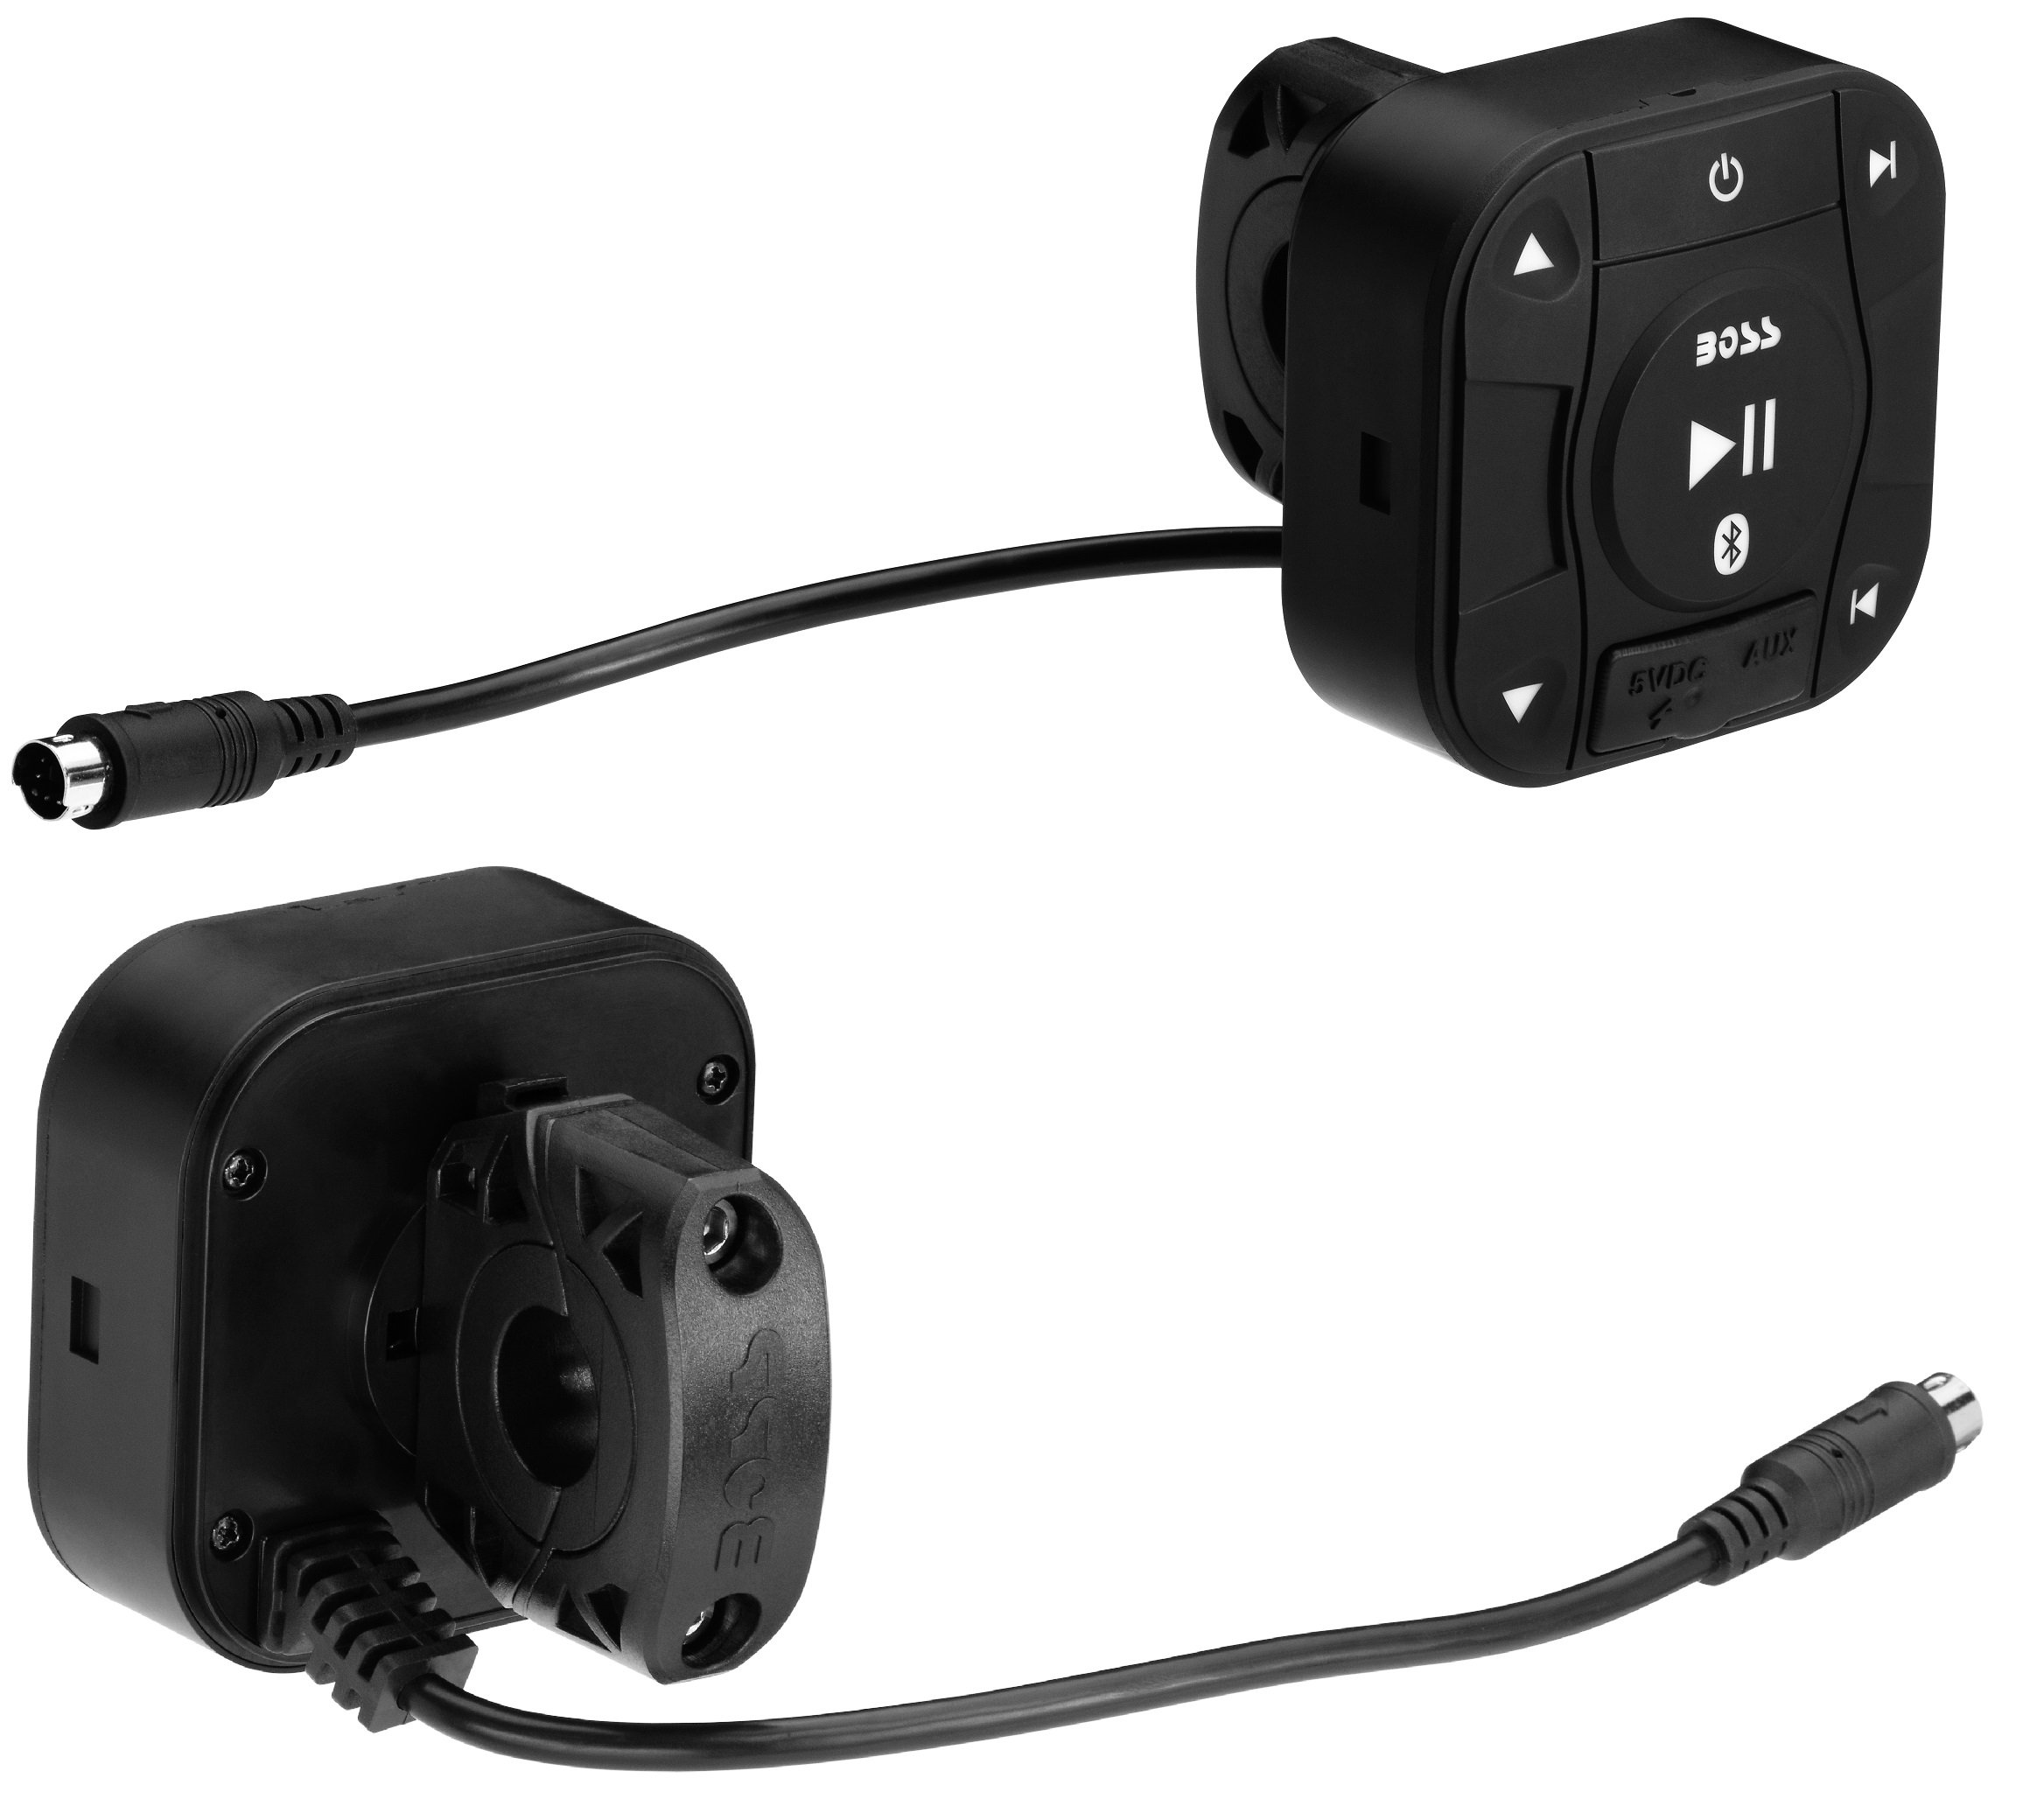 BOSS Audio ATVB90 Bluetooth, Amplified,  ATV/UTV Sound System, Weather-Proof Marine Grade, Bluetooth Remote, 12 Volt Application Friendly by BOSS Audio (Image #5)